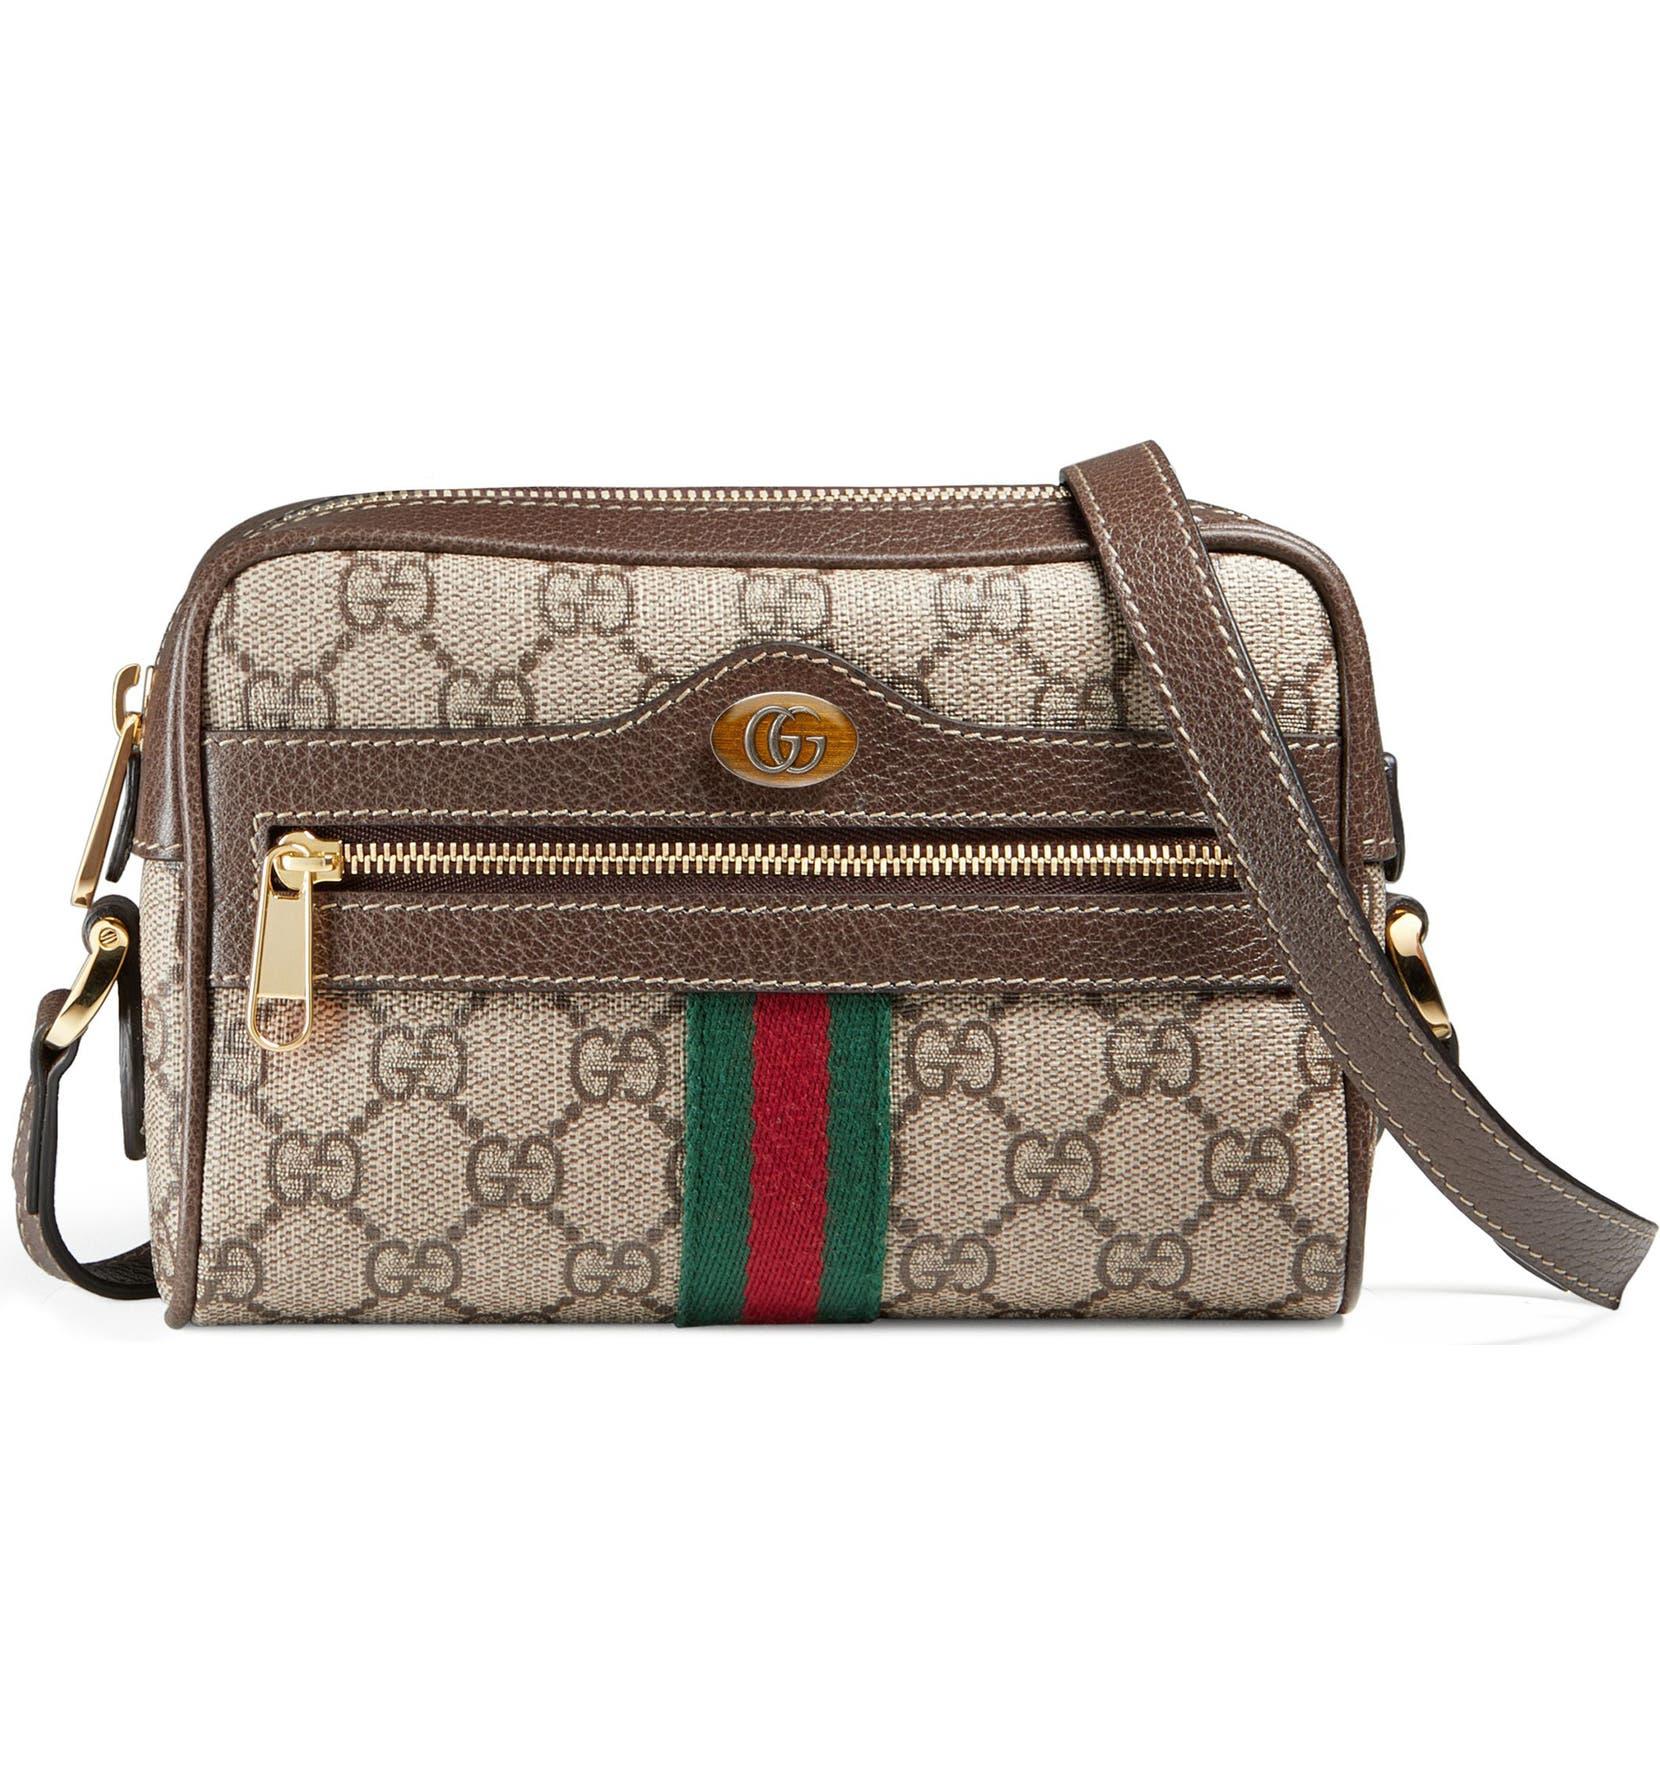 86bf774506a Gucci Ophidia Small GG Supreme Canvas Crossbody Bag